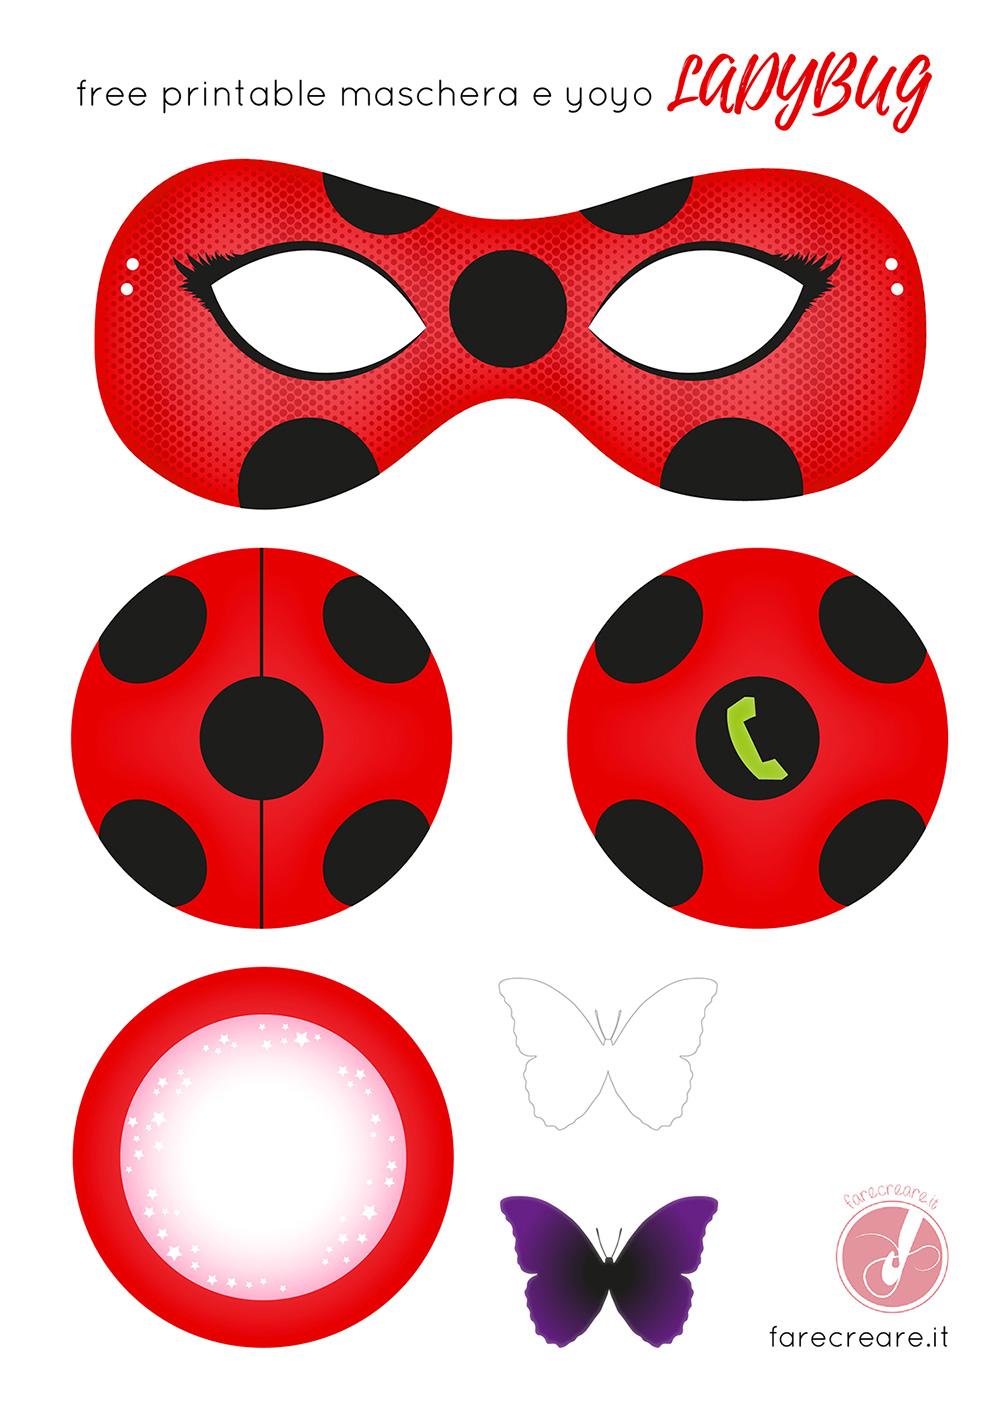 Lw ladybug free printable maschera yoyo 02 farecreare for Disegni miraculous da colorare